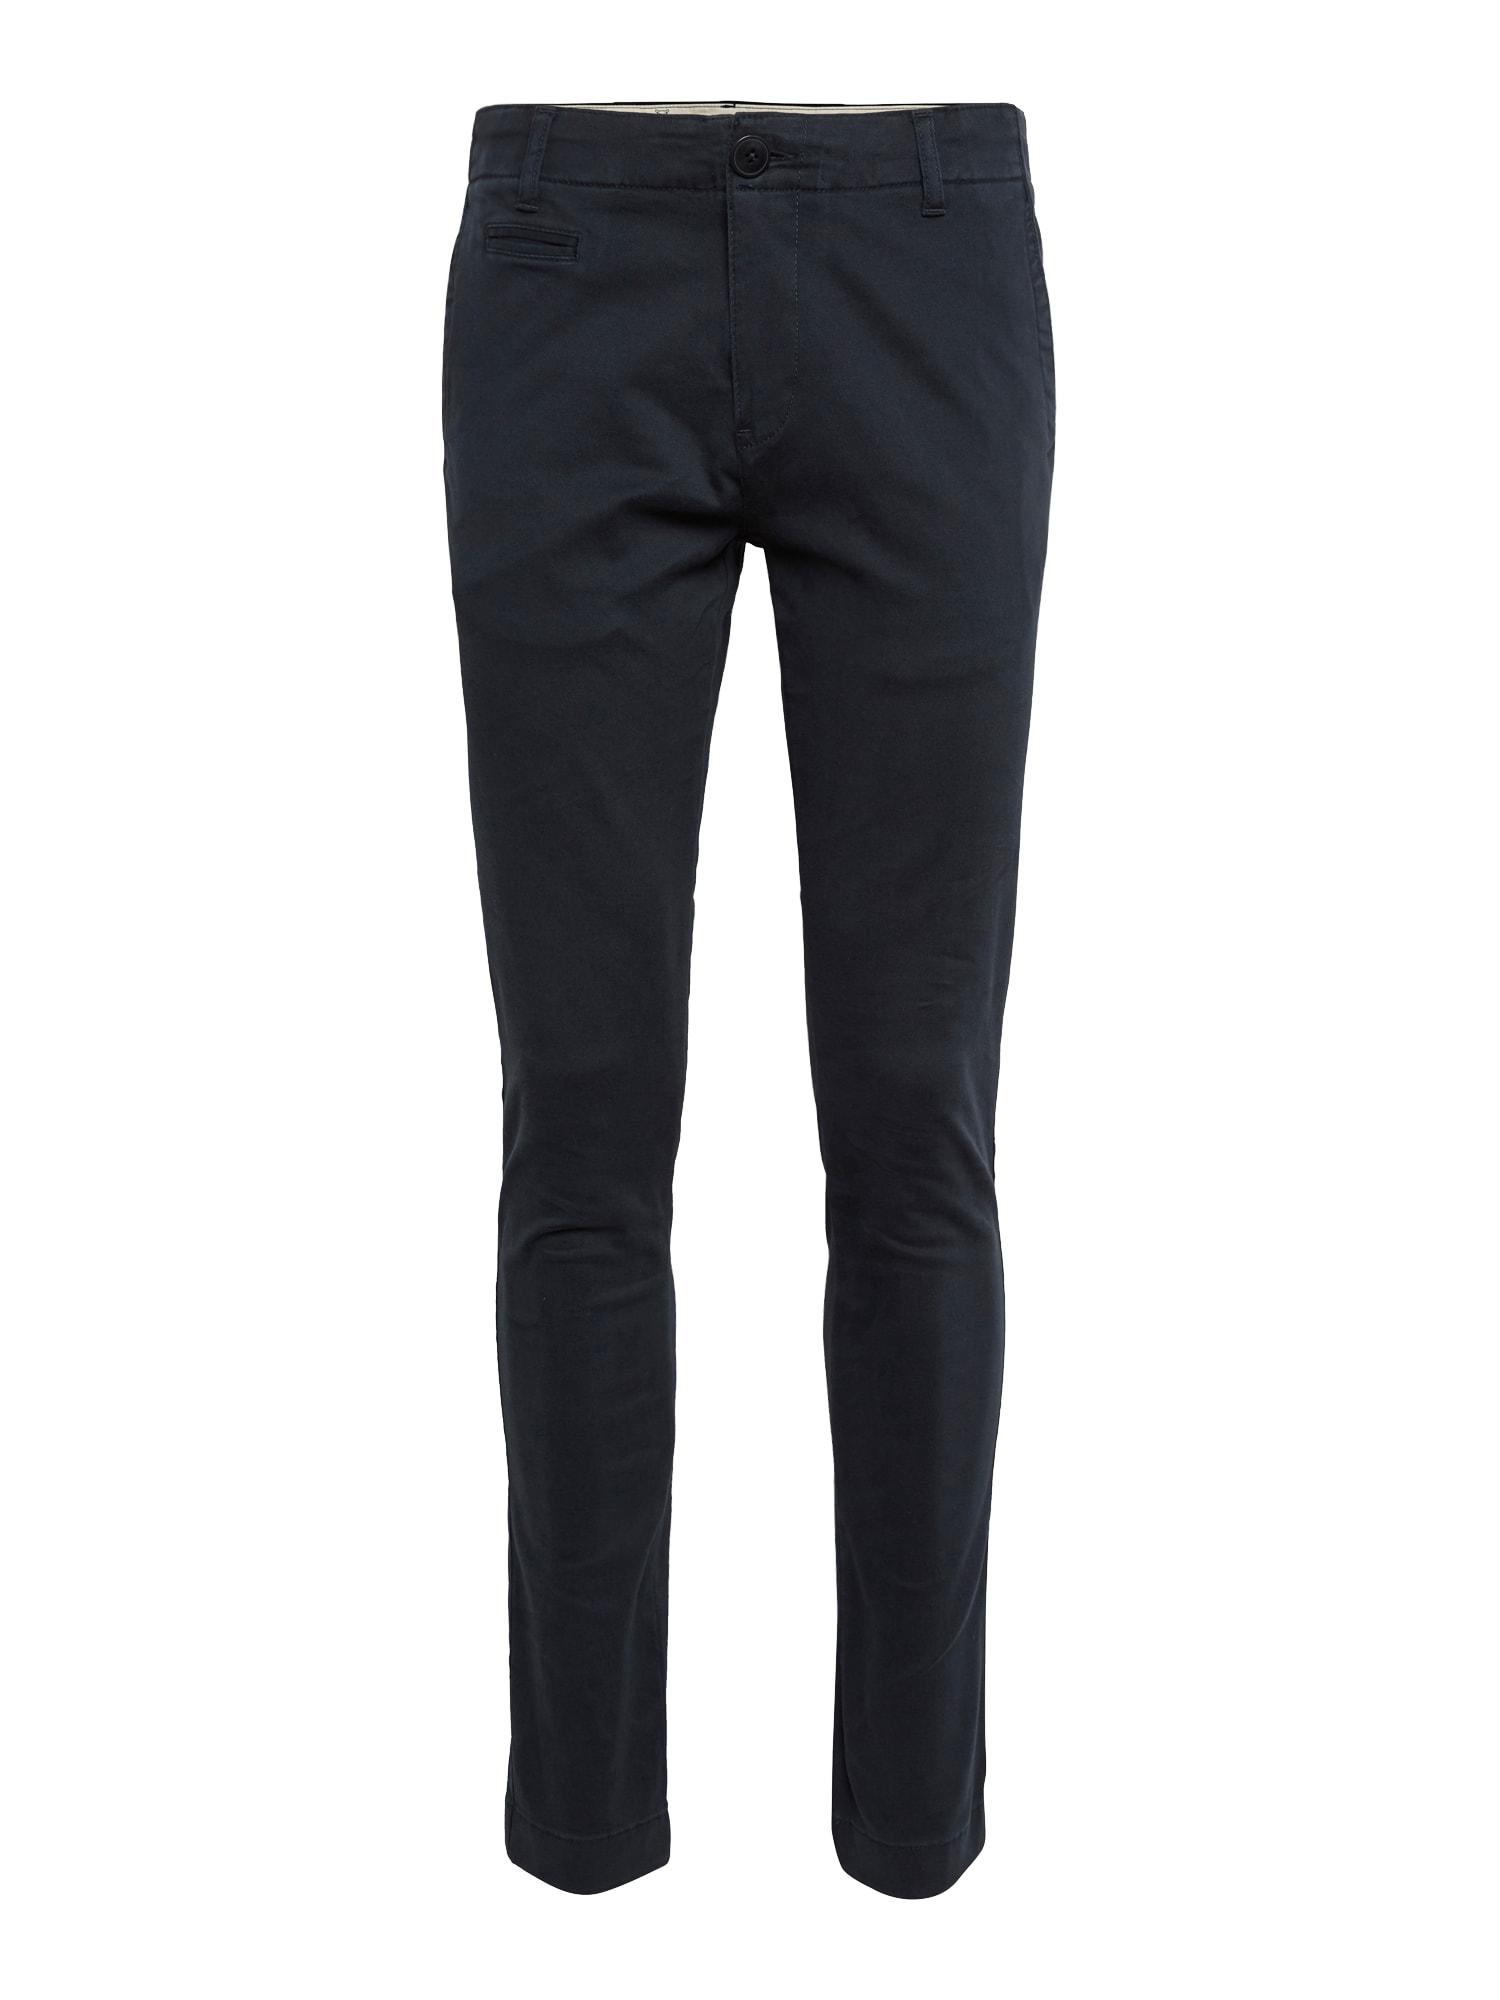 Chino kalhoty Pistol Joe tmavě modrá KnowledgeCotton Apparel